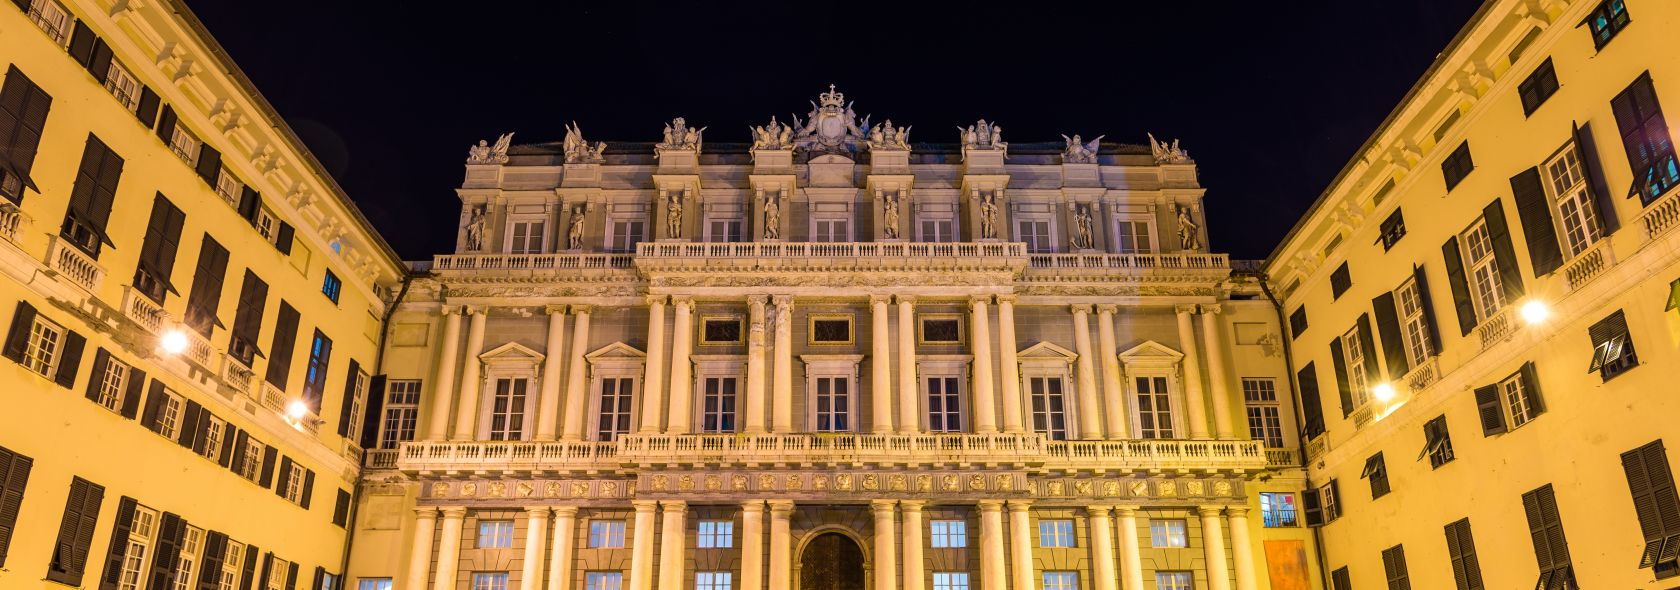 Palazzo Ducale - notturno